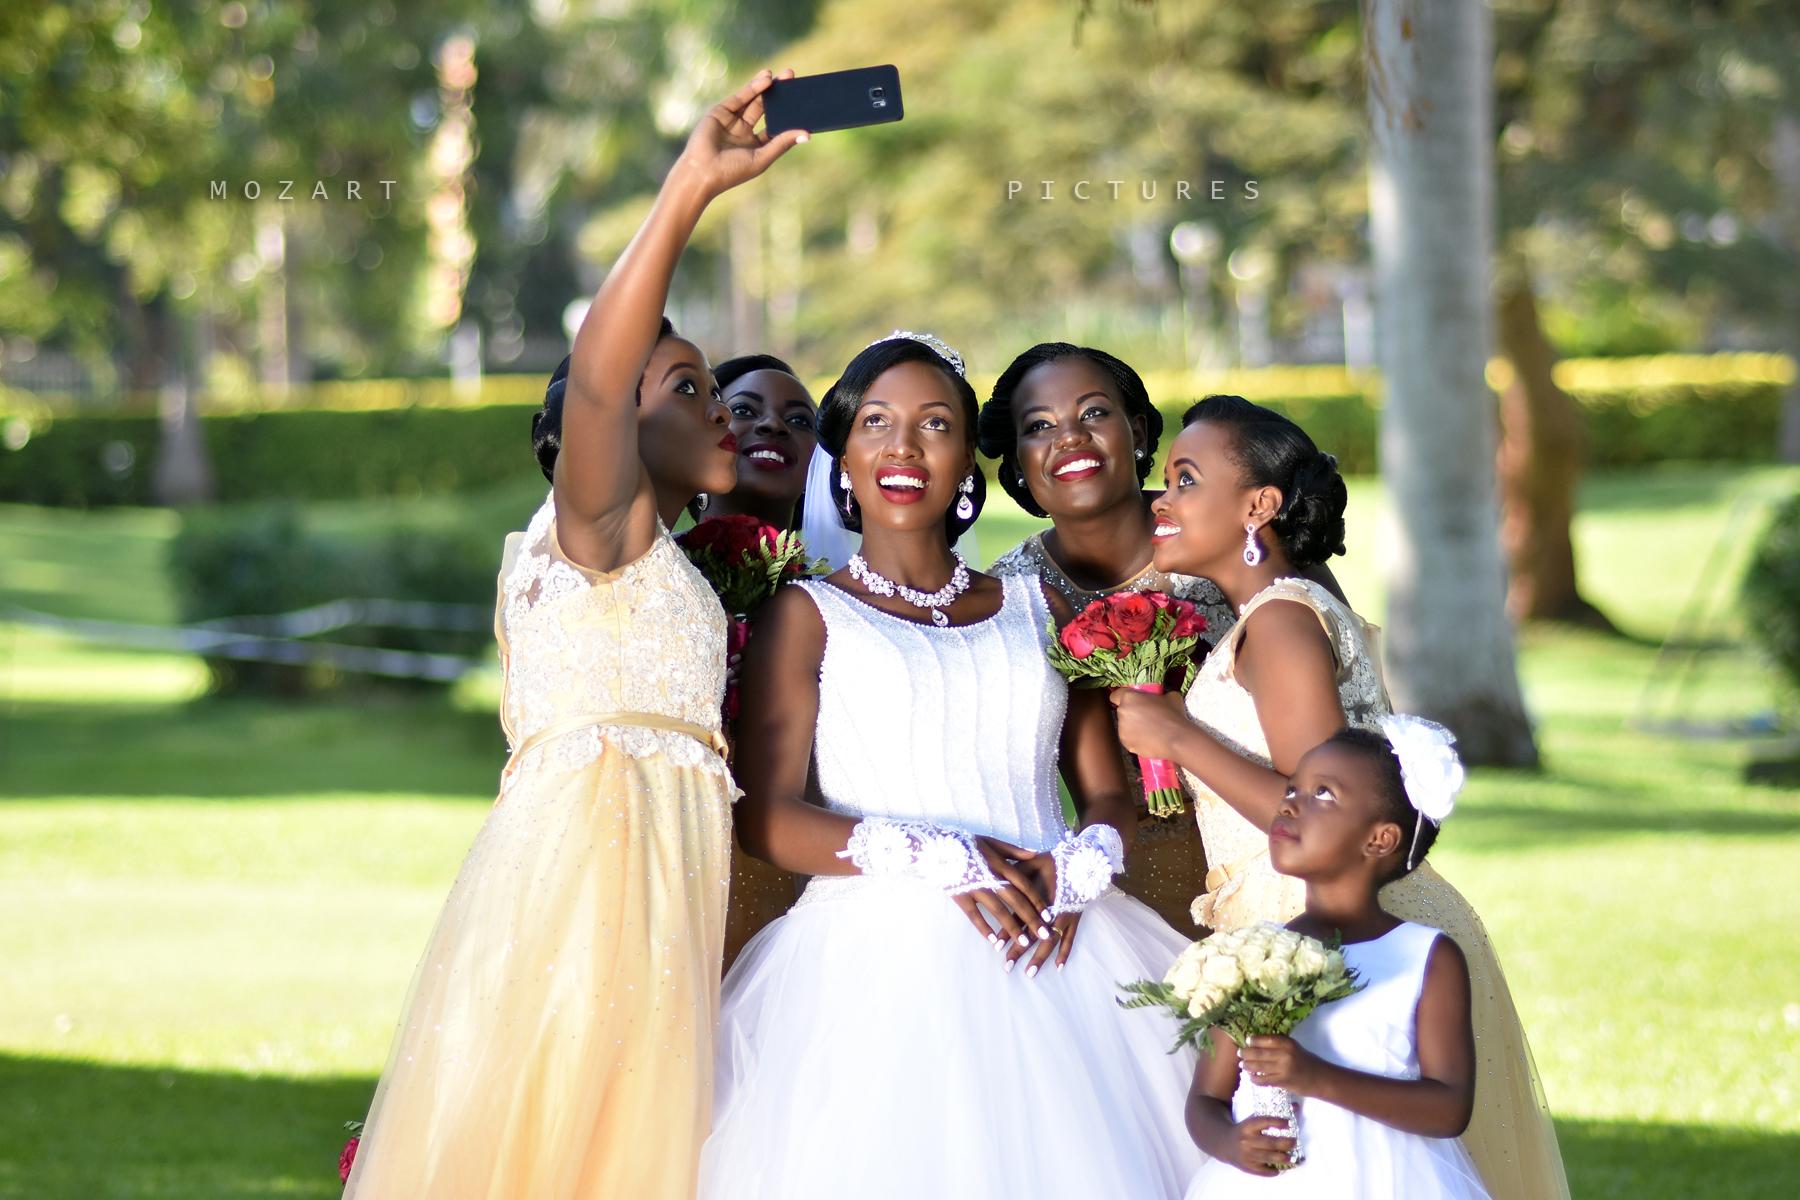 Racheal and Bridesmaids Wedding Selfie Moments